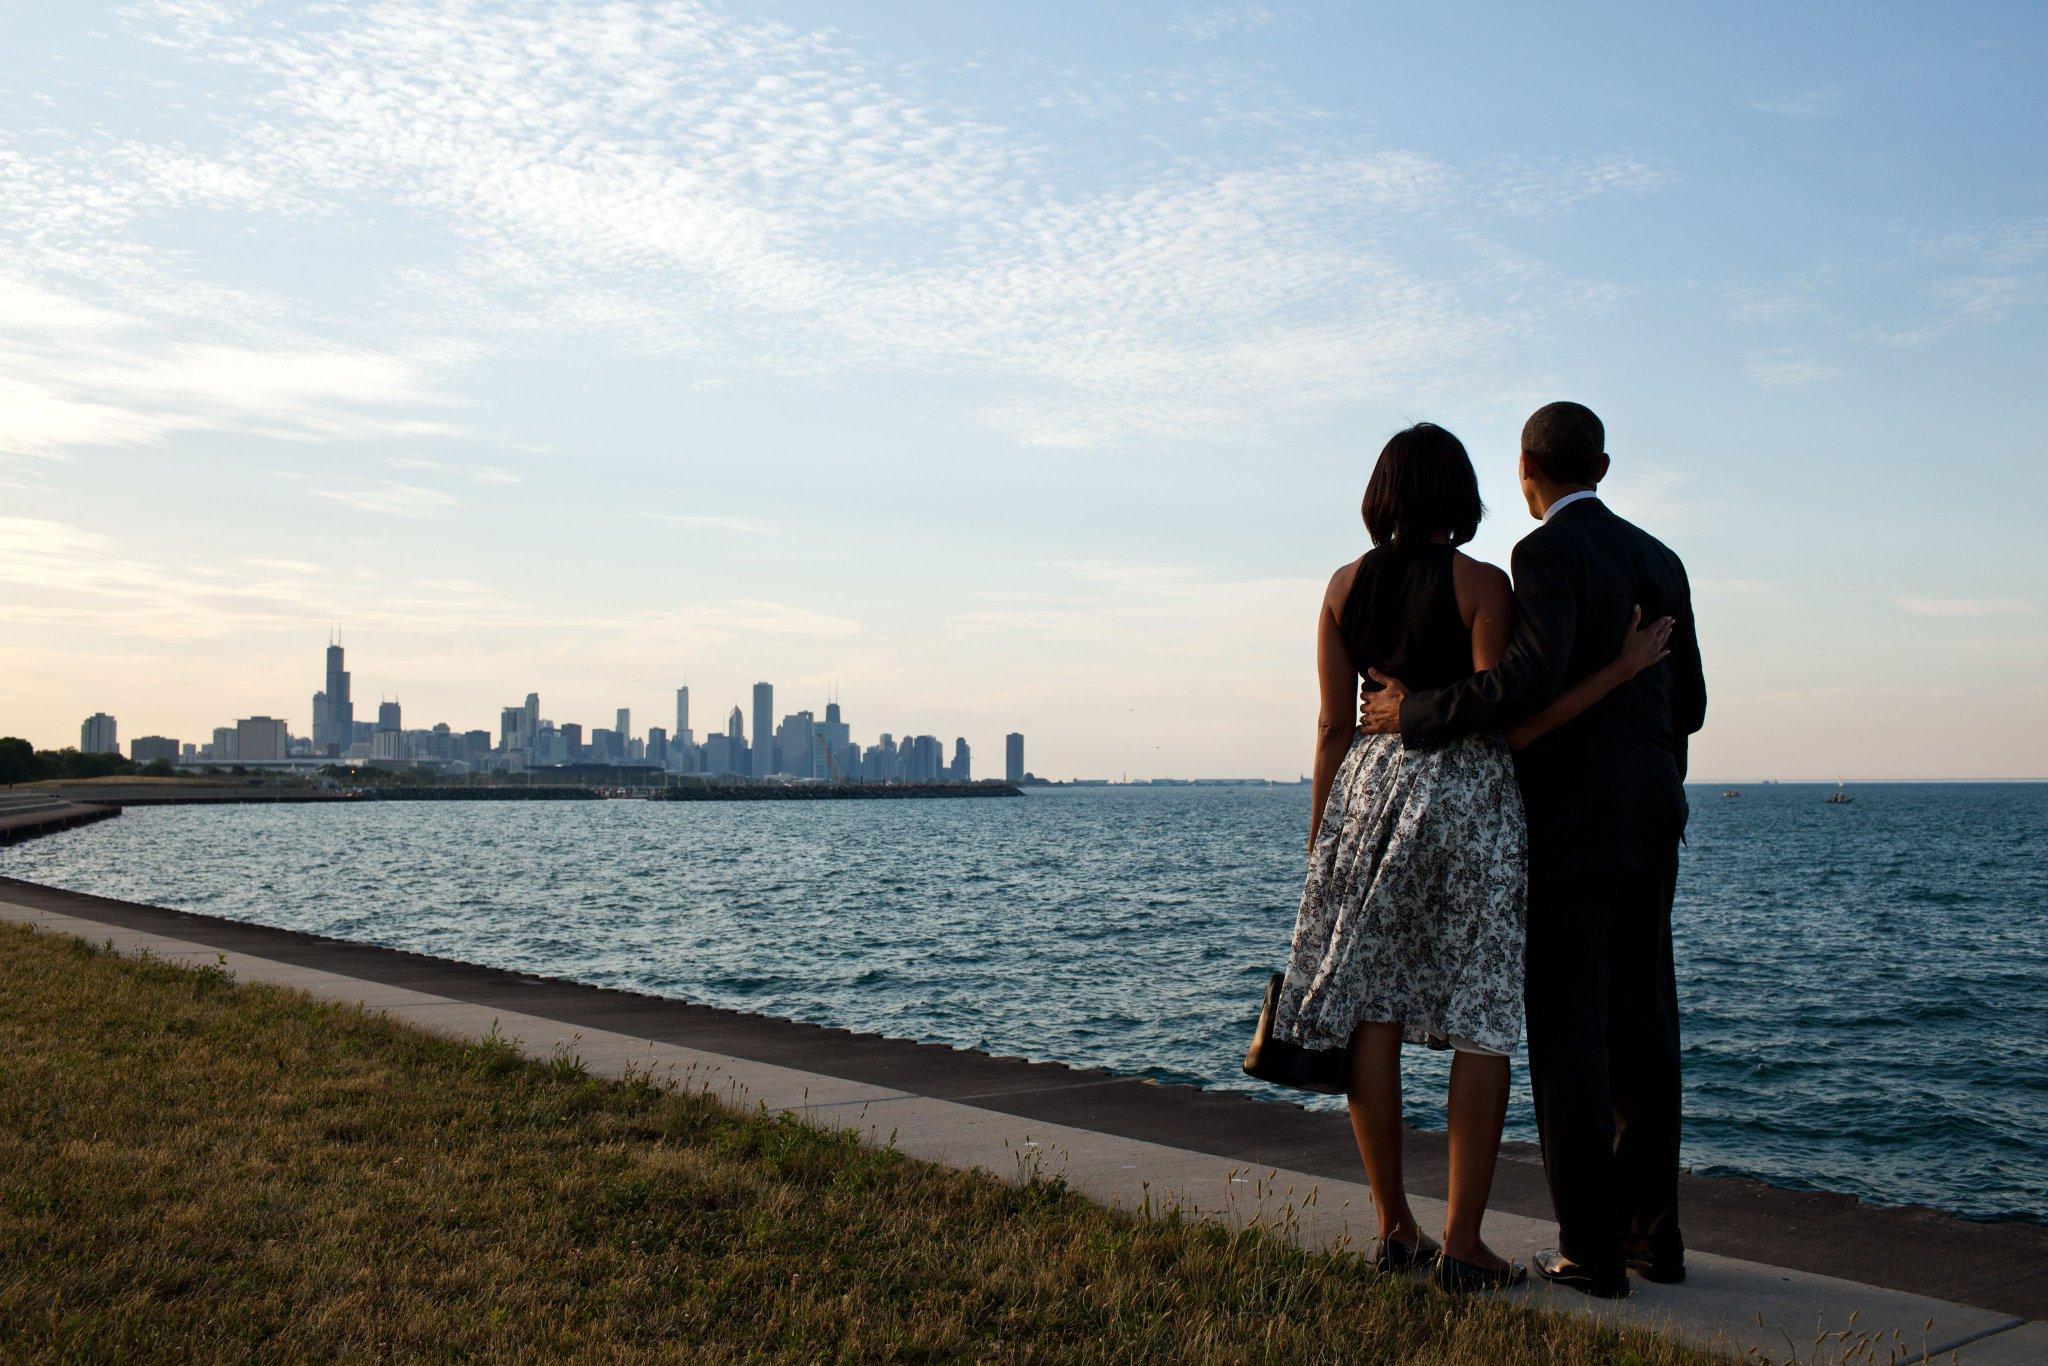 Thumbnail for @BaracksFlagpin Gives His #ObamaFarewell Address